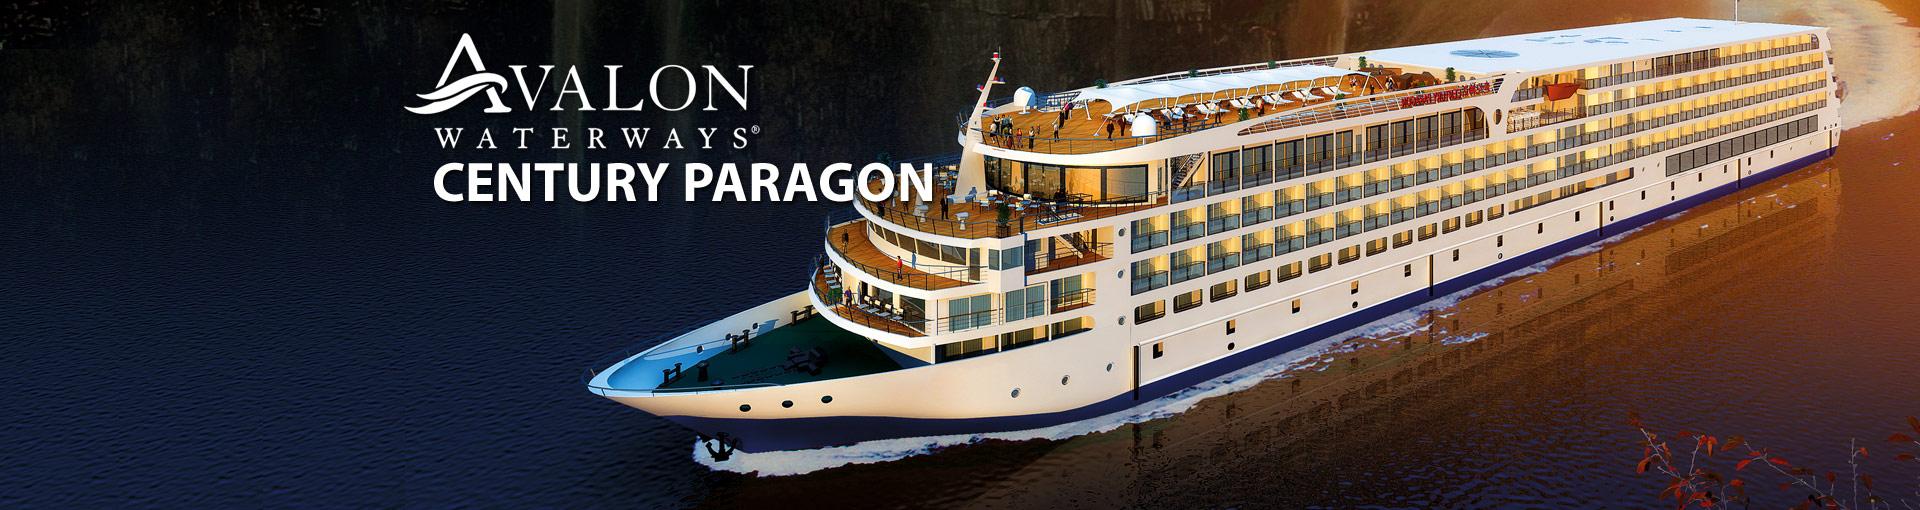 Avalon Waterways River Cruises Century Paragon cru